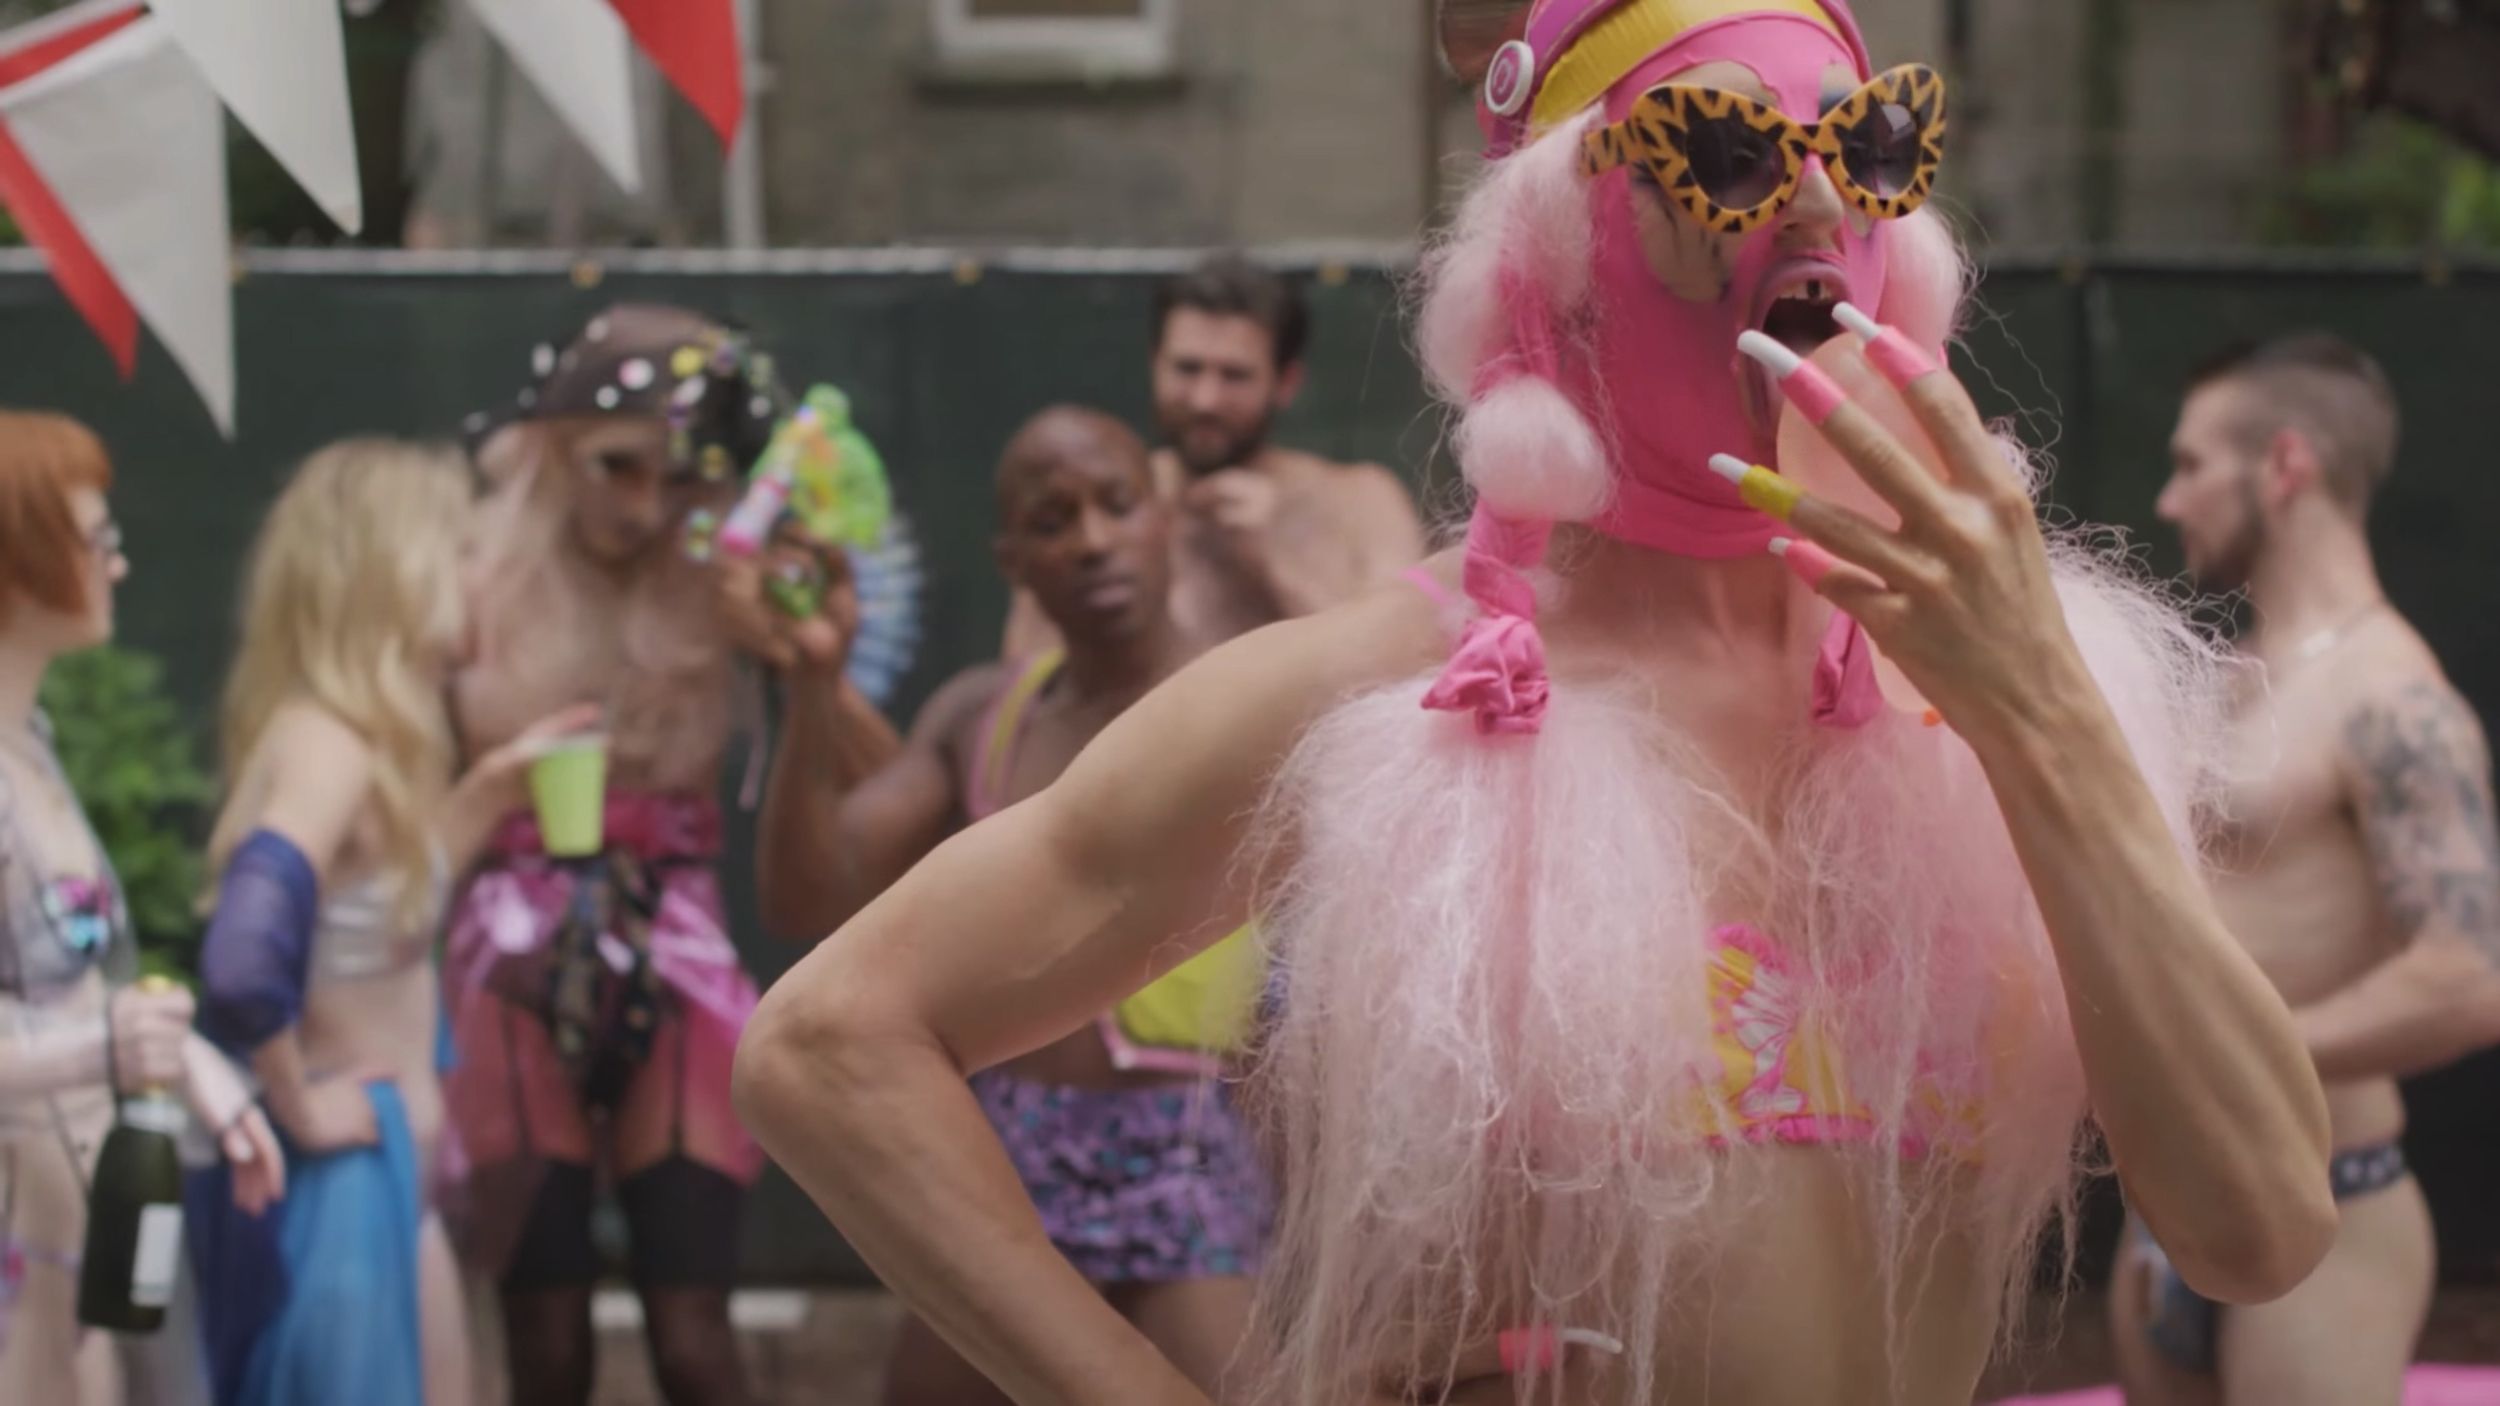 """'VIBIN REMIX"" by Big Dipper - music video"